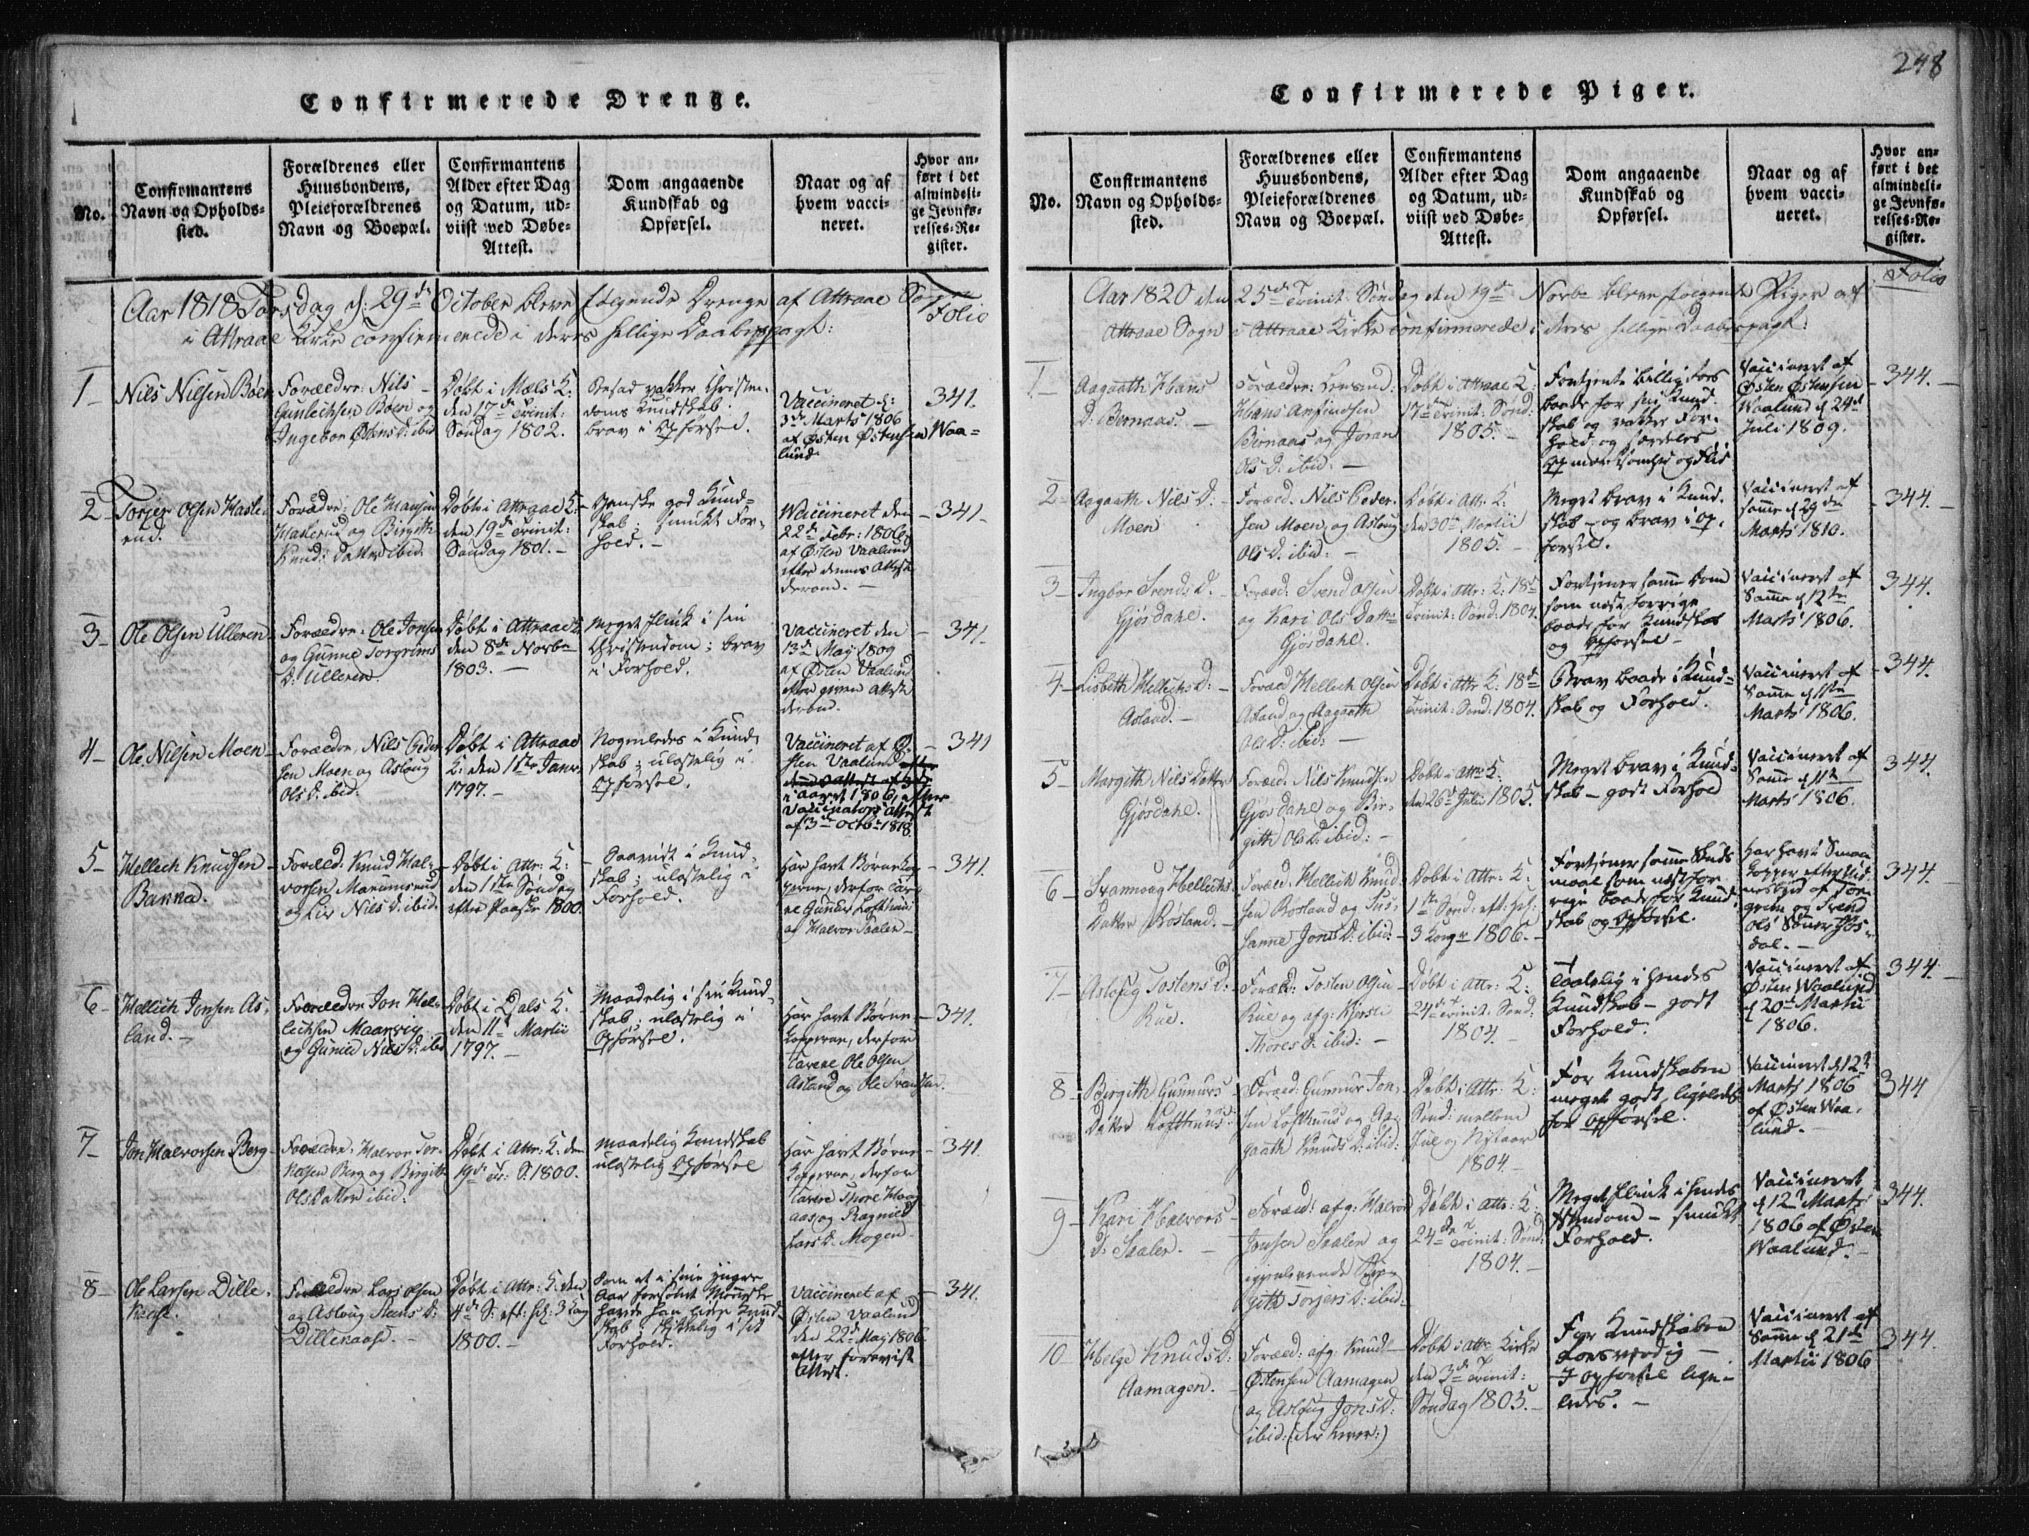 SAKO, Tinn kirkebøker, F/Fa/L0004: Ministerialbok nr. I 4, 1815-1843, s. 248